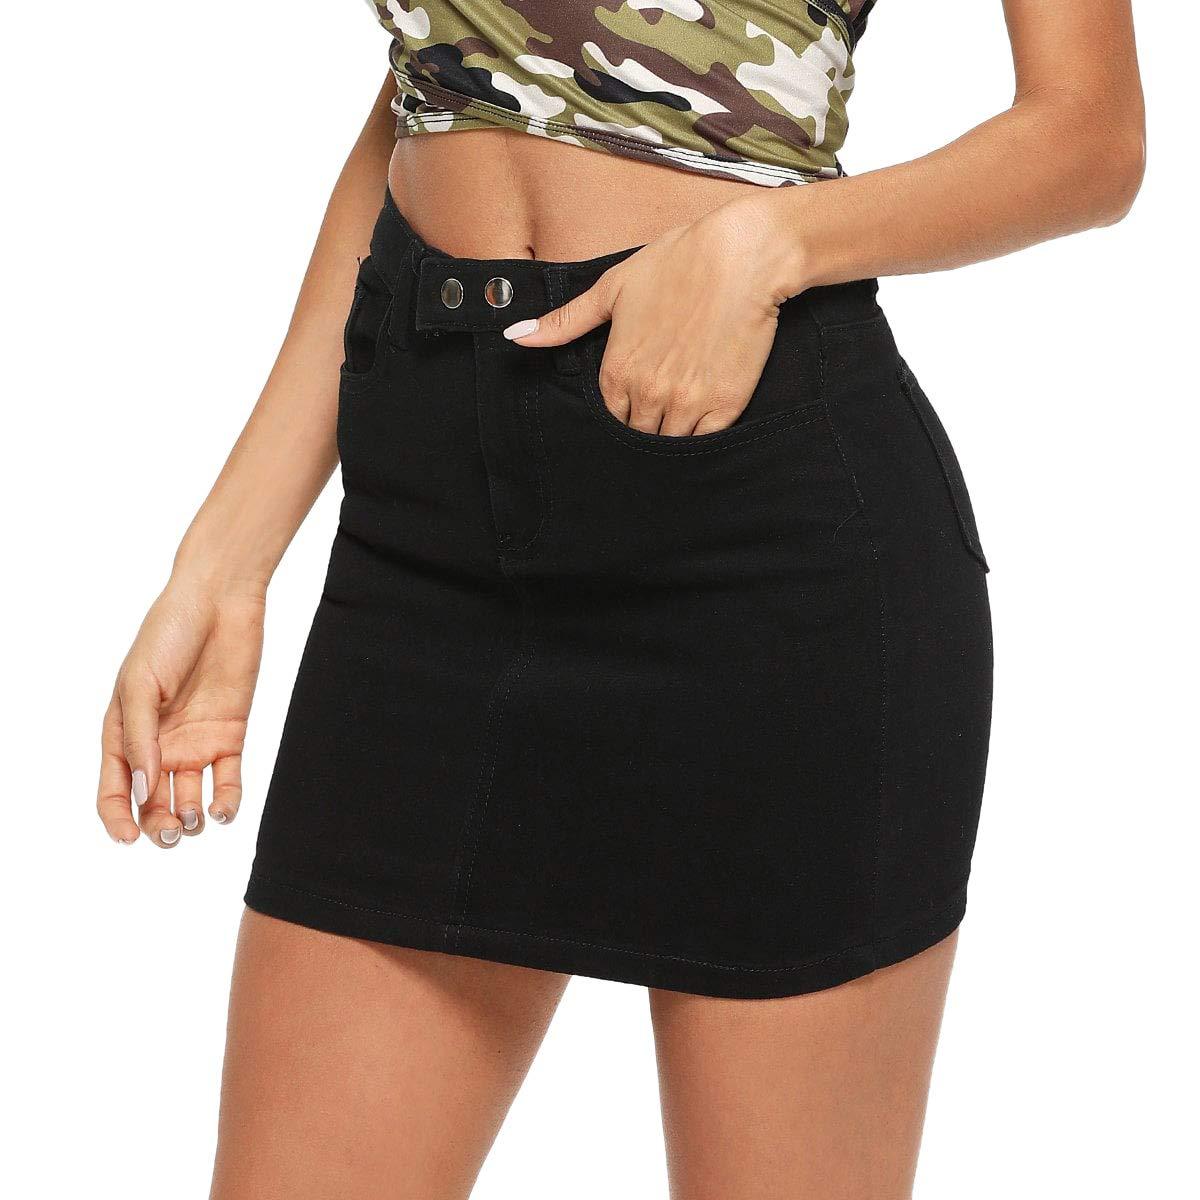 Black SheIn Women's Solid Casual Denim ALine Short Bodycon Skirt